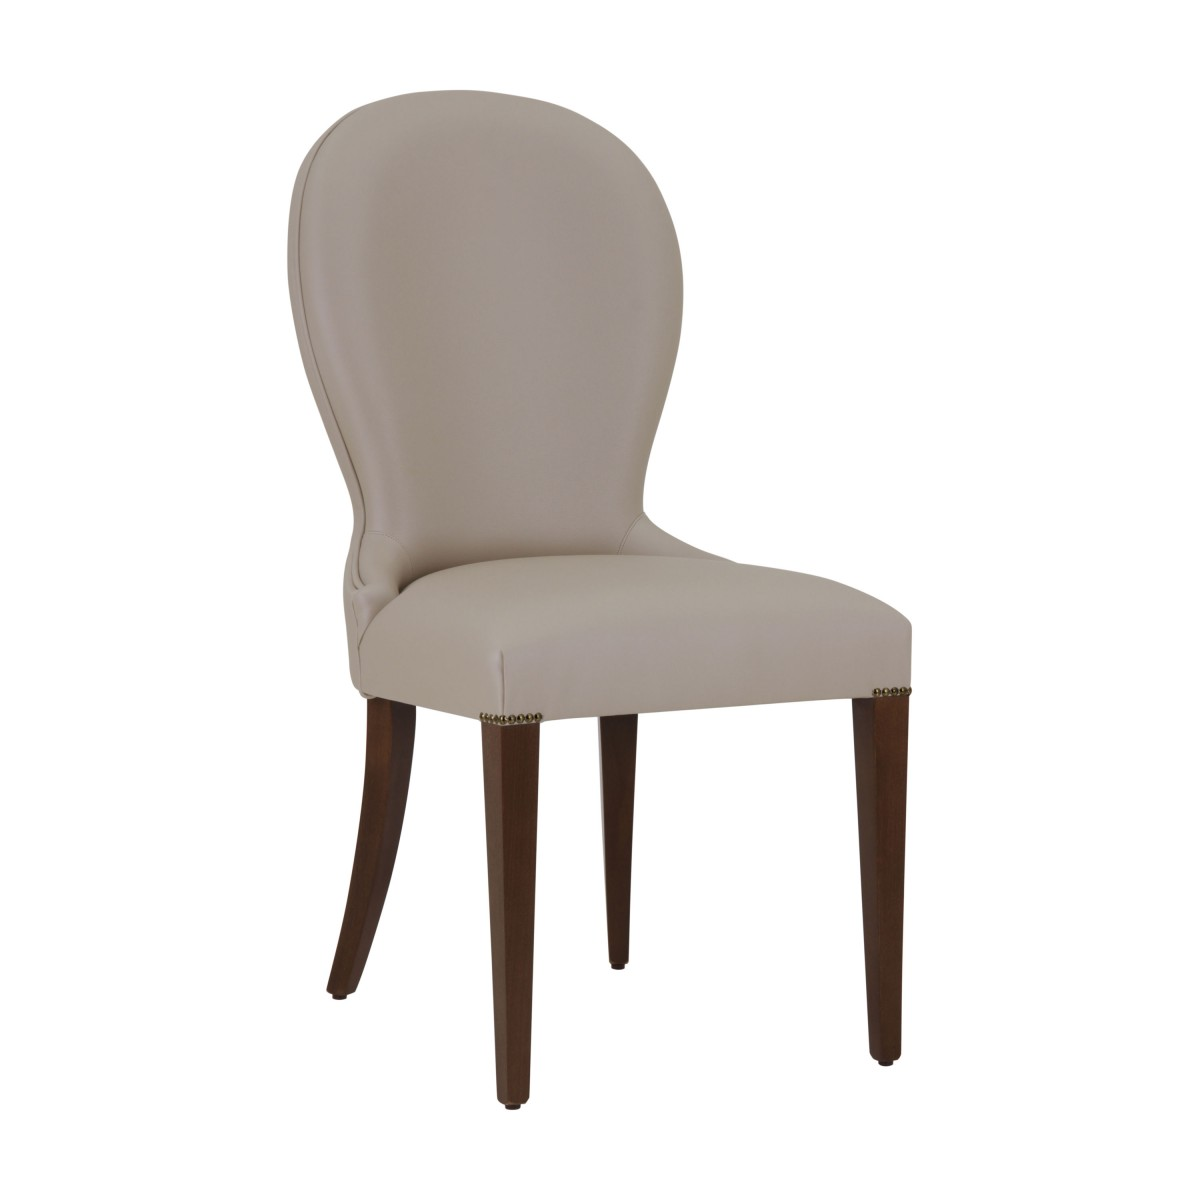 restaurant chair calipso 3686